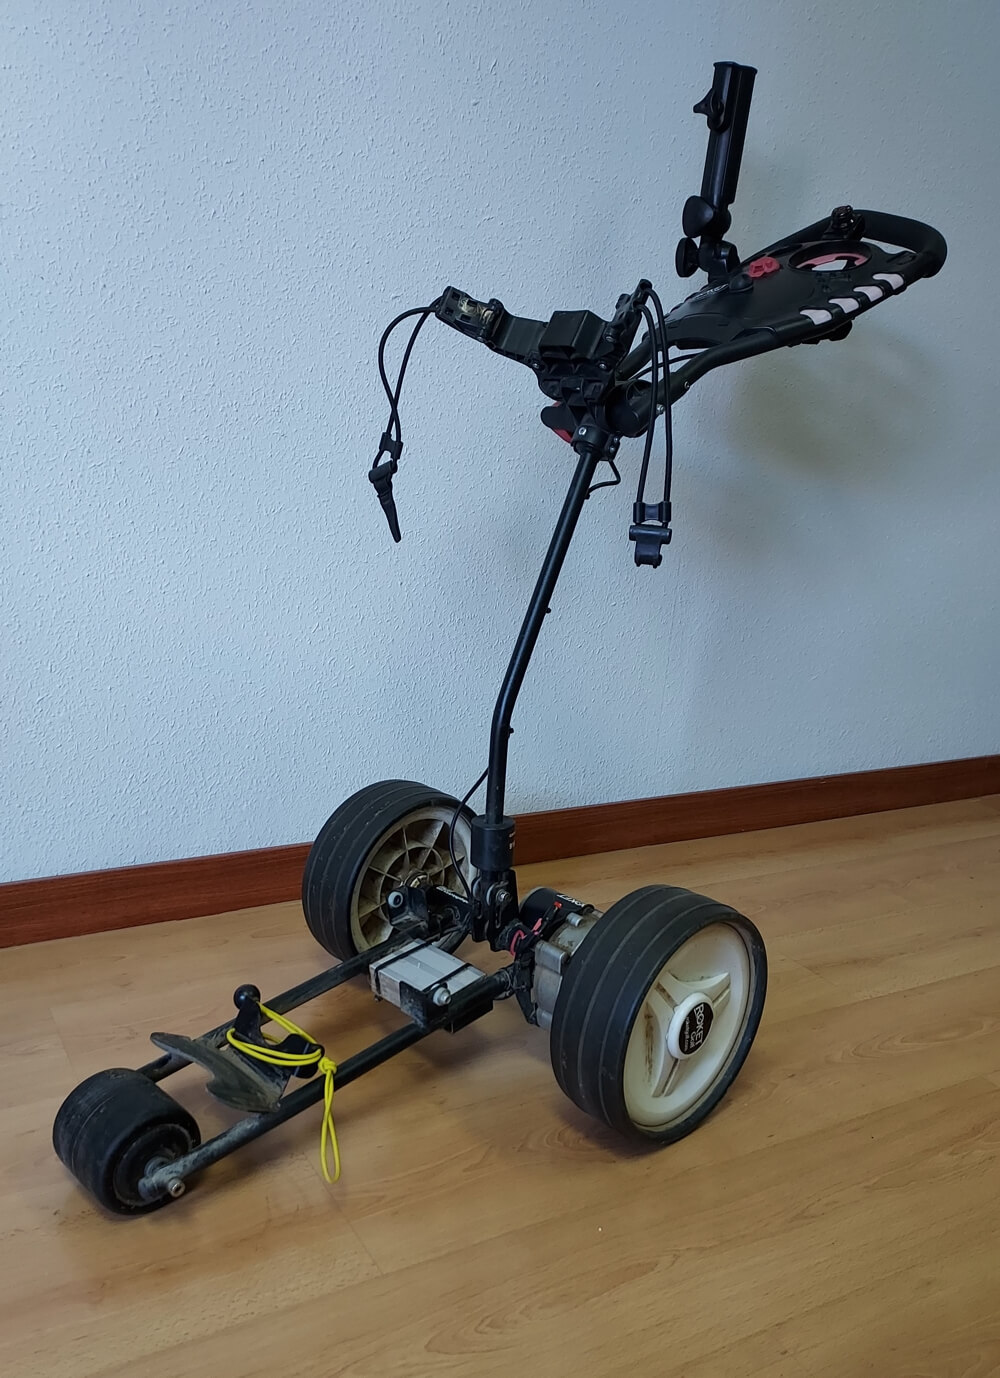 Carro de Ocasión Roket consola Tollem  149 euros